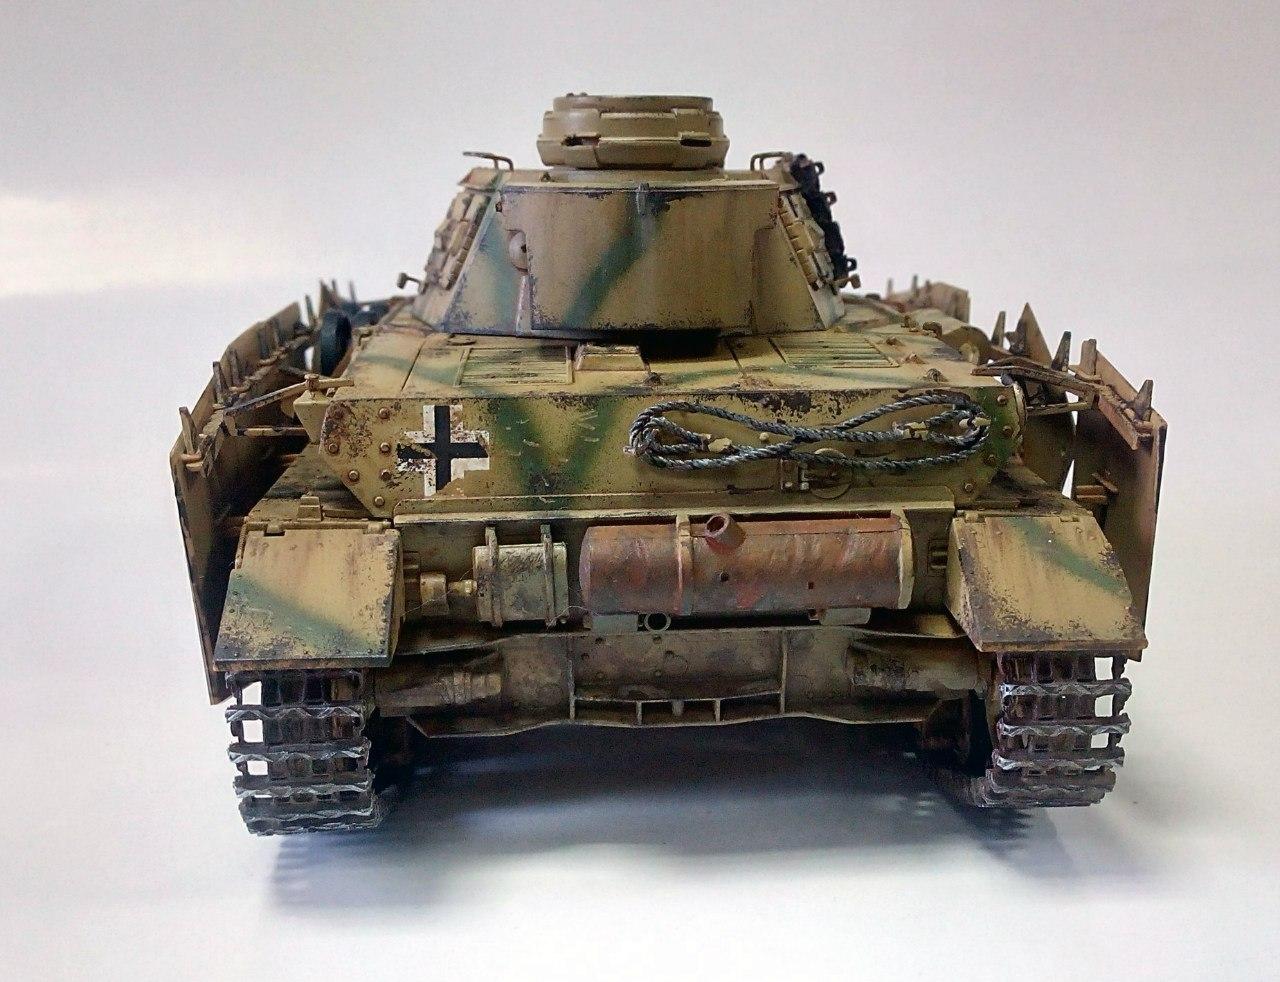 Бронетехника и артиллерия NLRMd71HLLQ